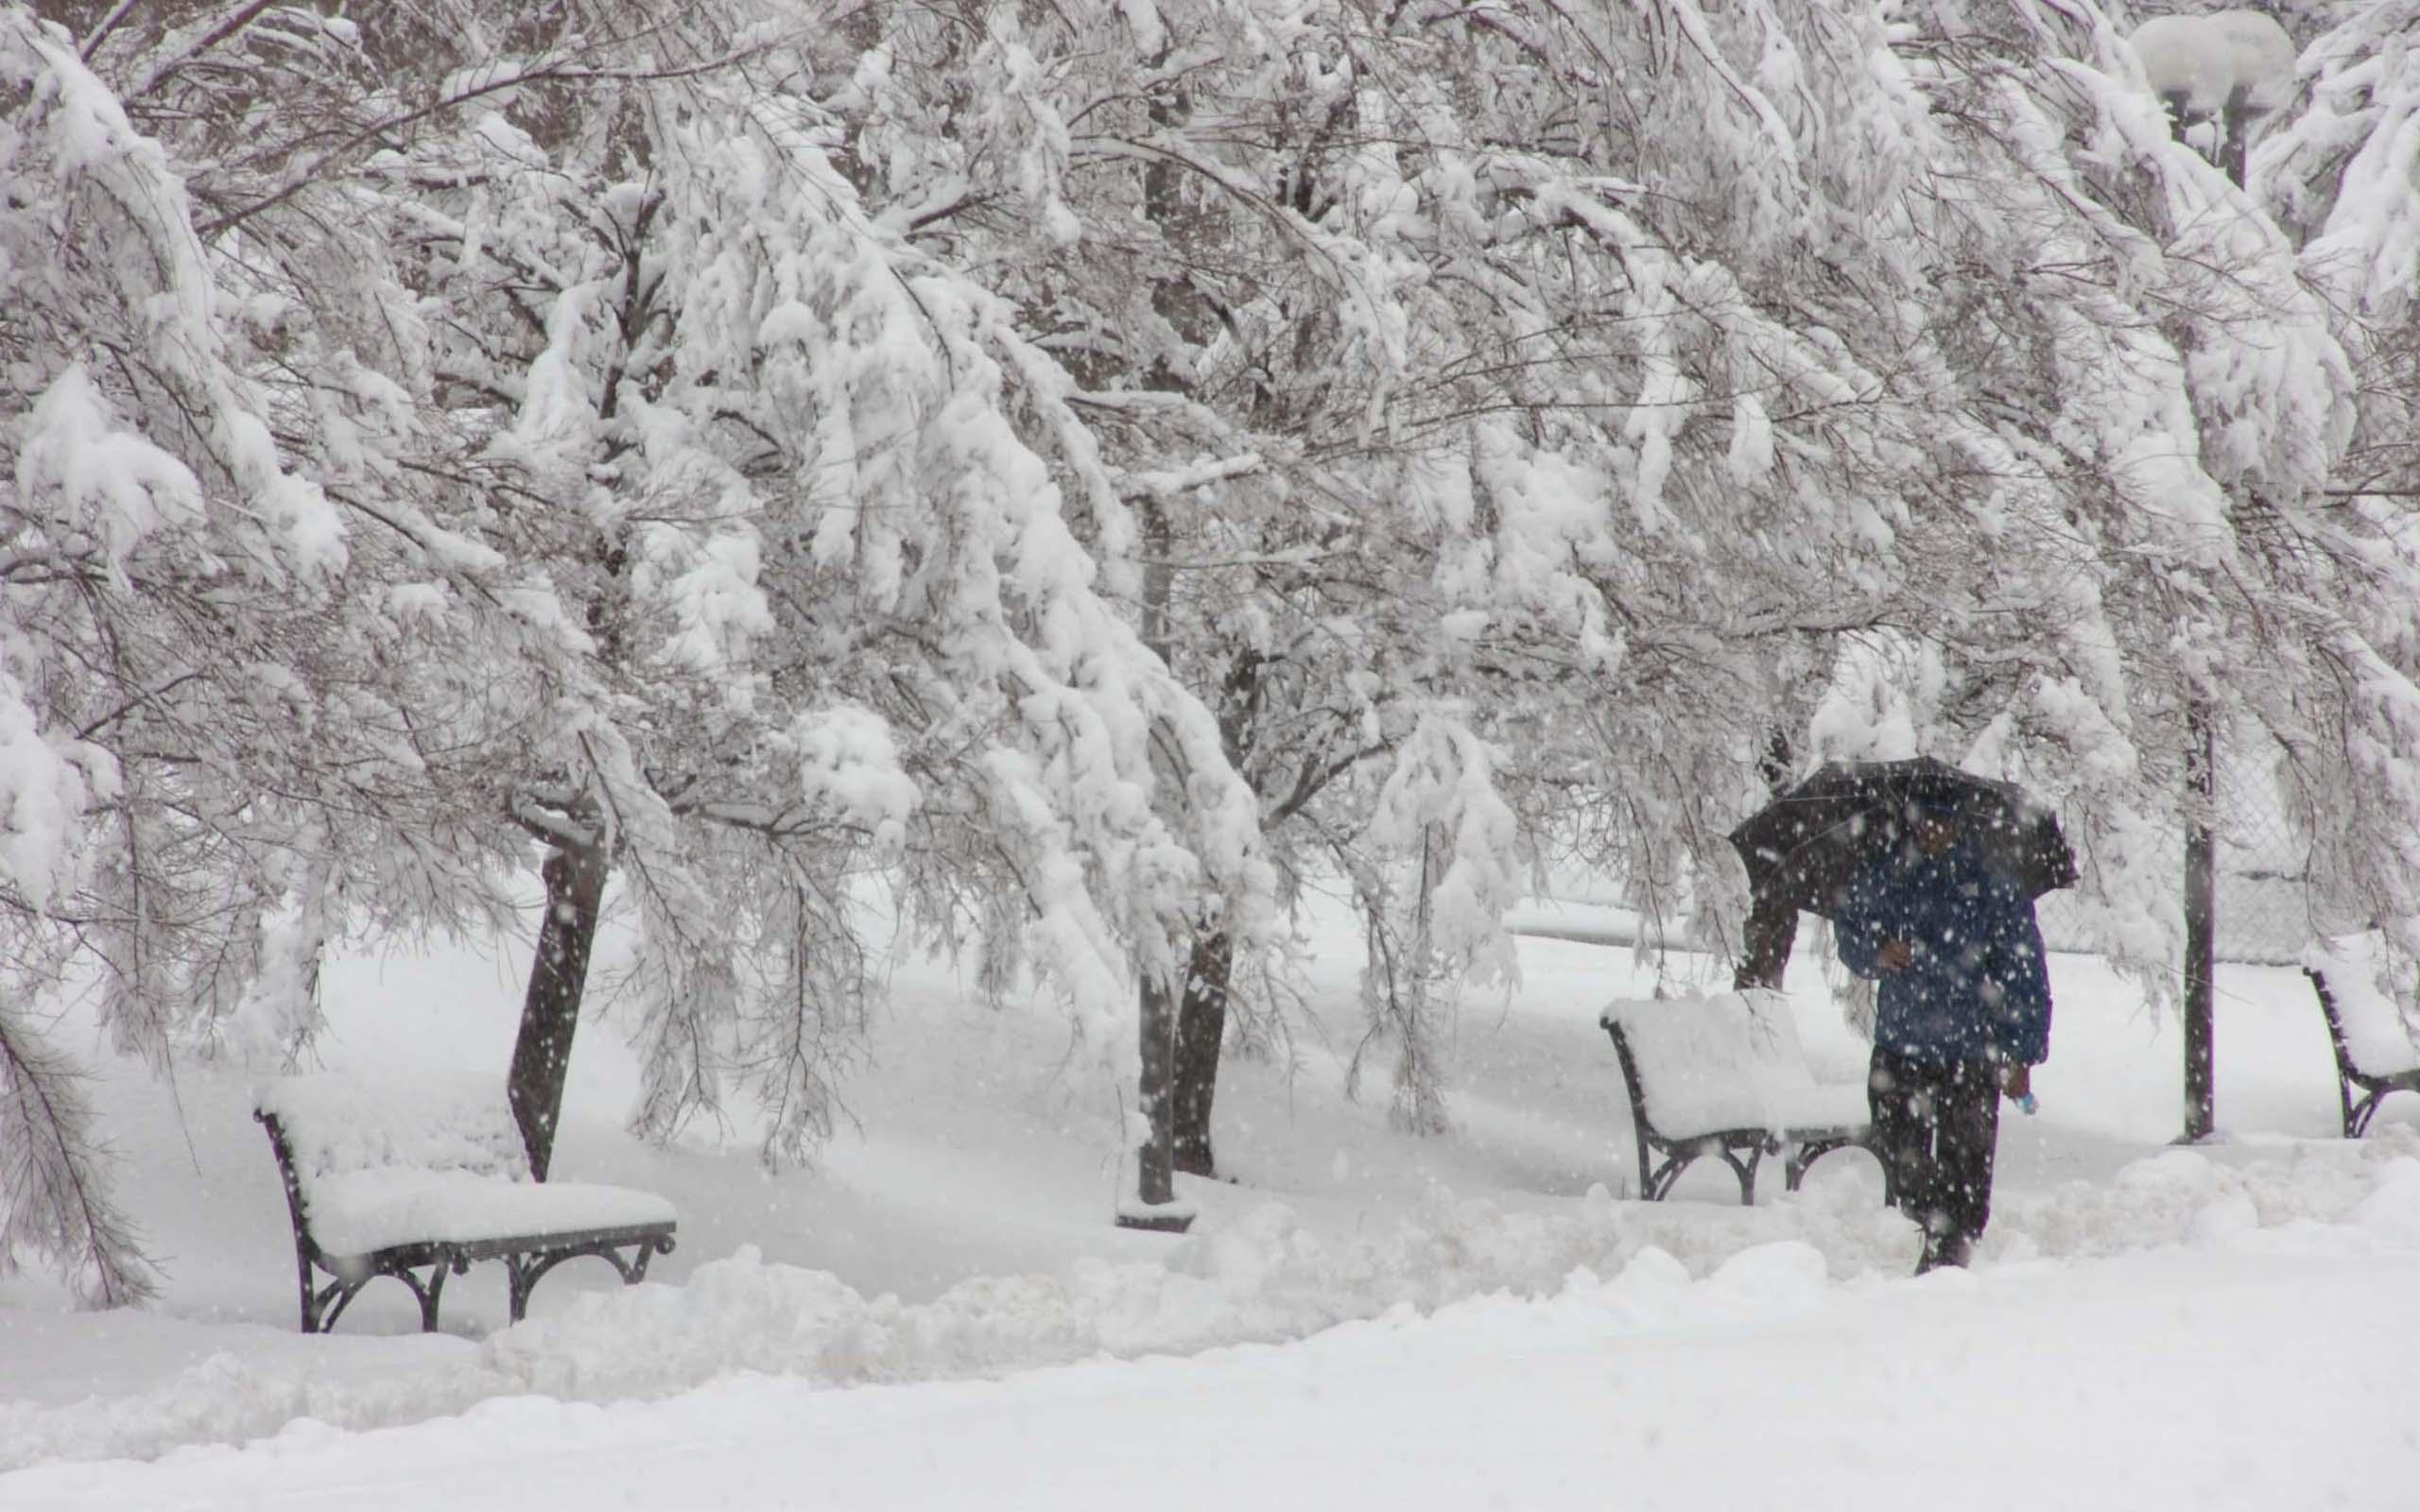 Snowy Winter Scenes Wallpaper Wallpapersafari